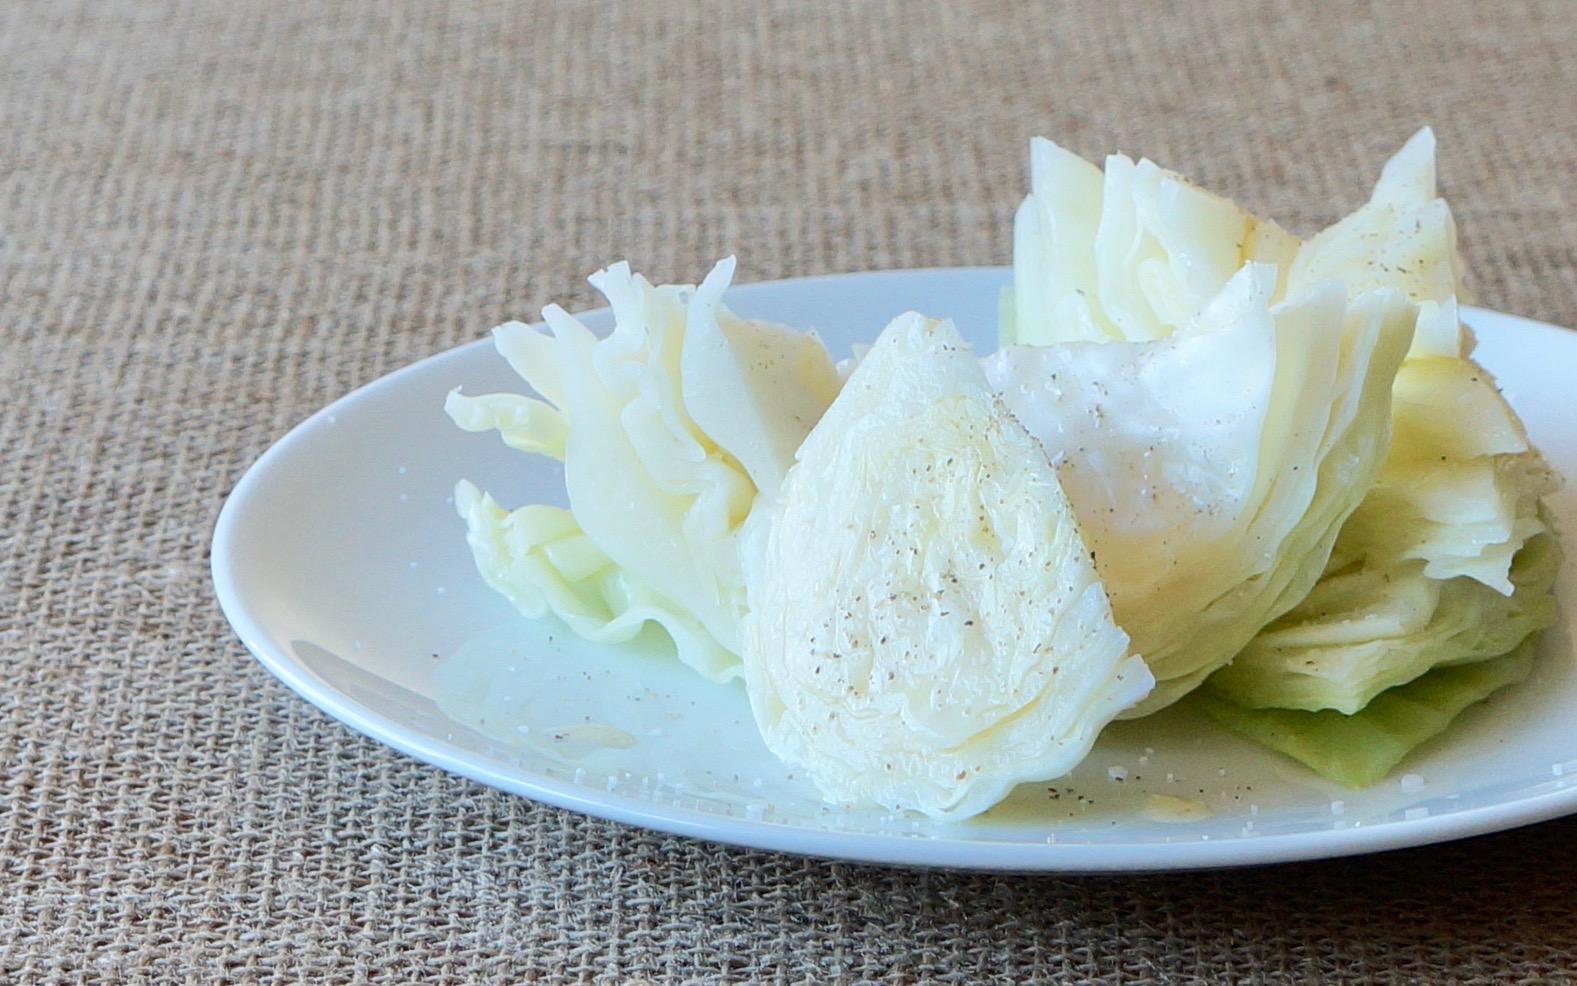 Steamed-Cabbage-Rebecca-Gordon-Publisher-Buttermilk-Lipstick-Culinary-Entertaining-Technique-Southern-Hostess-RebeccaGordon-Pastry-Chef-Birmingham-Alabama